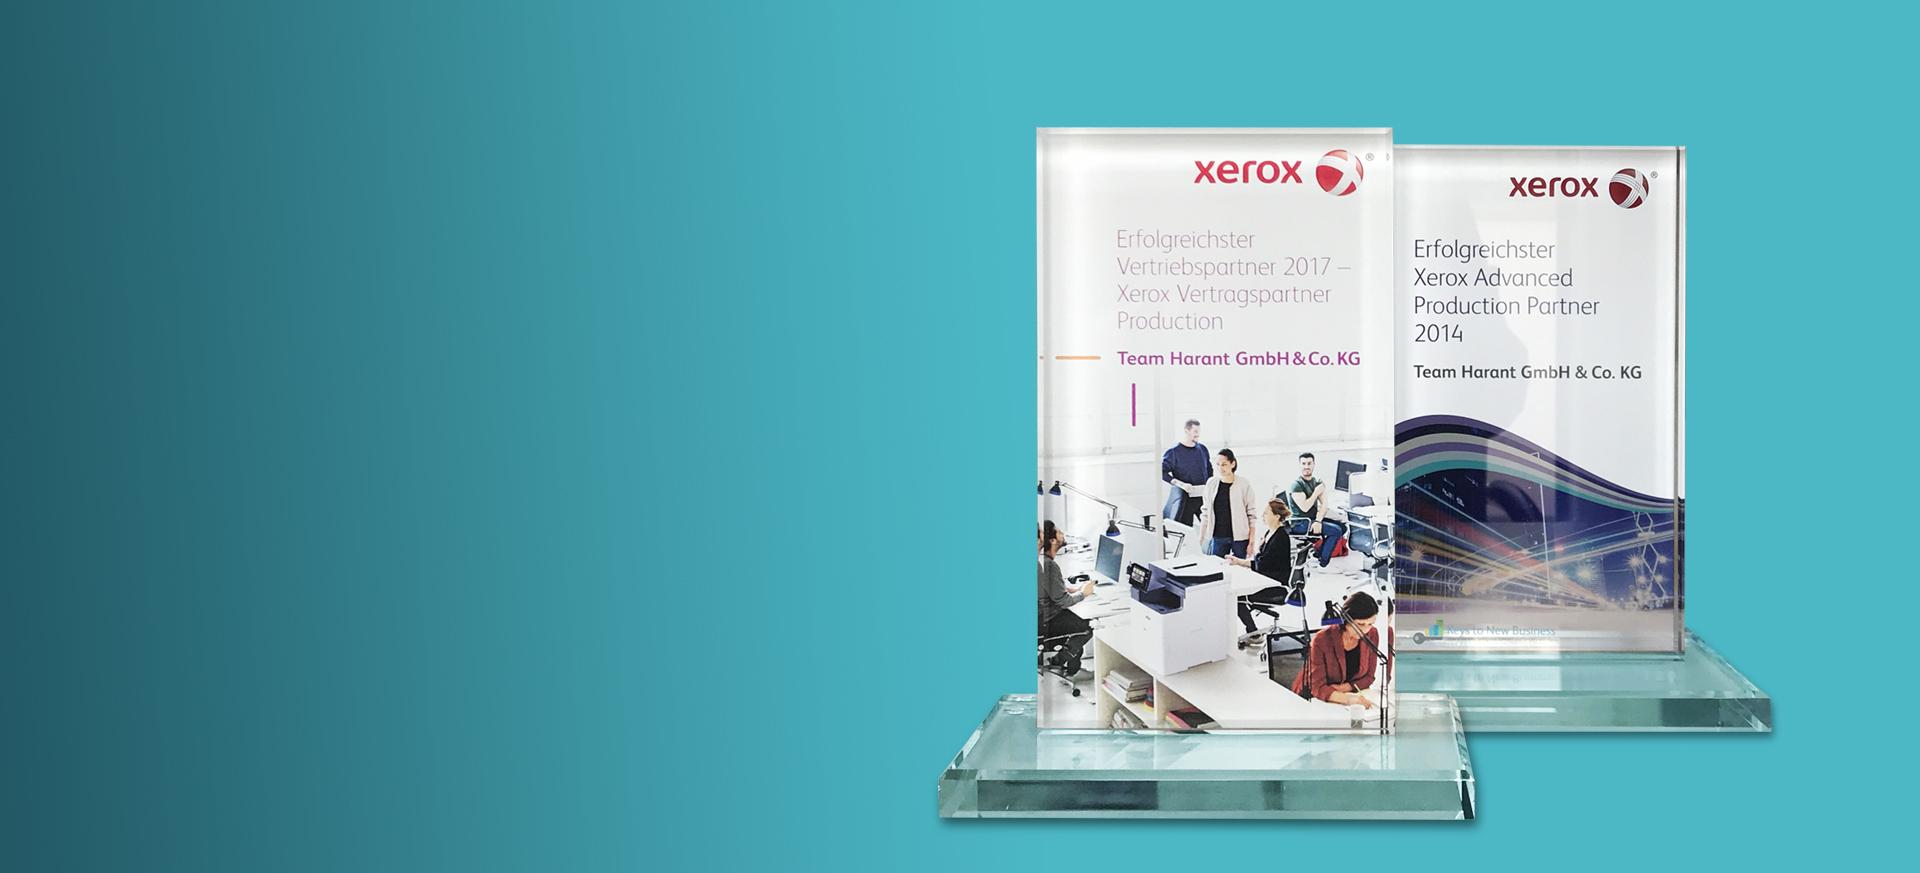 Erfolgreichster Xerox Vertragspartner Production